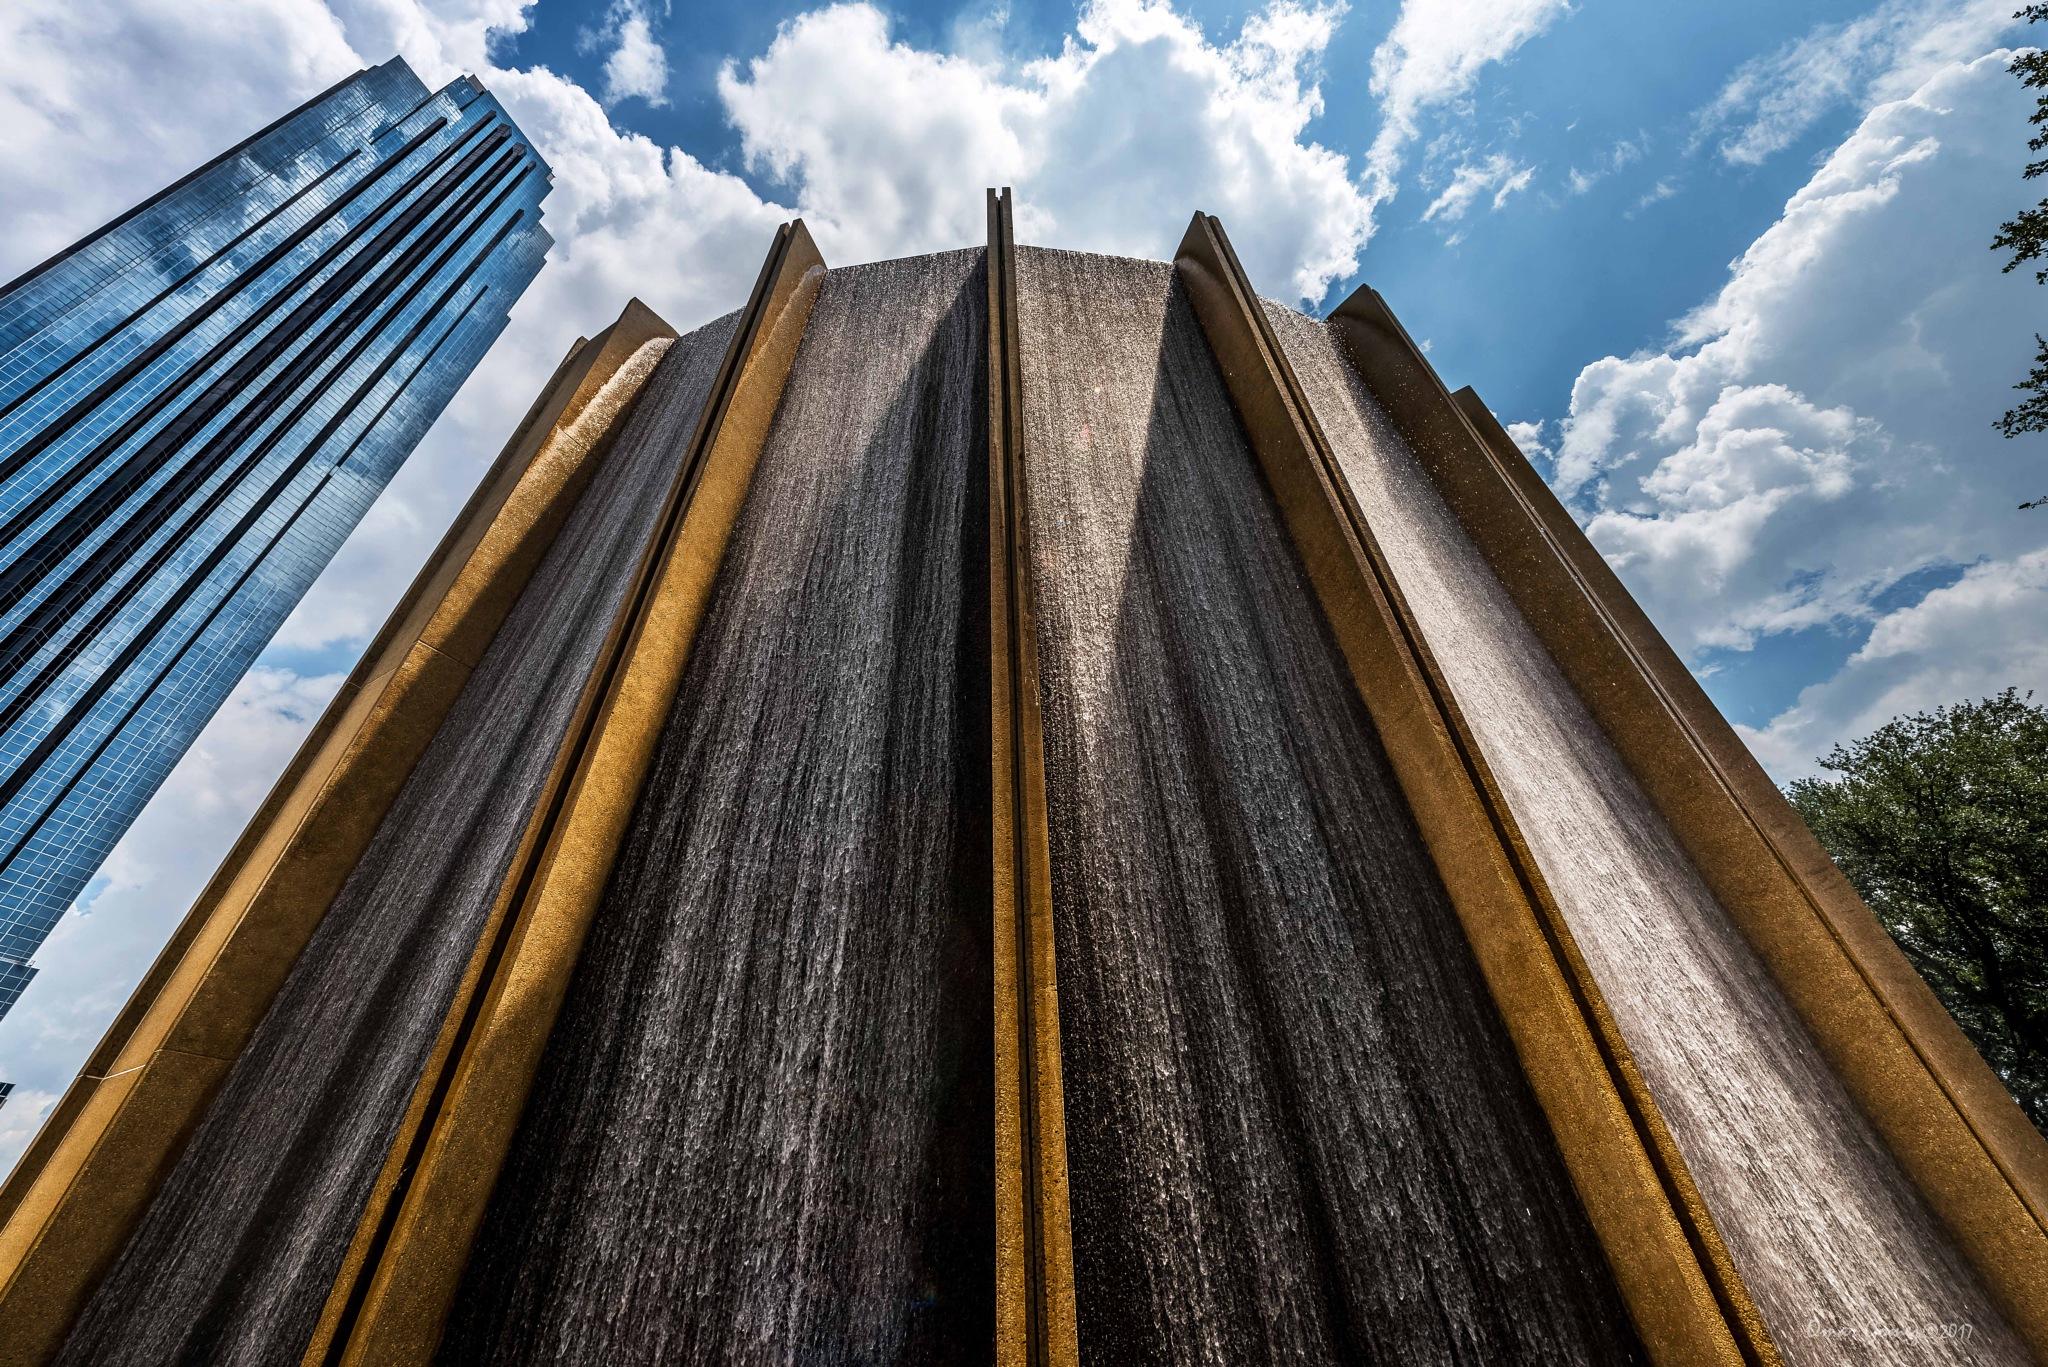 Houston Waterwall by Omar Gomez